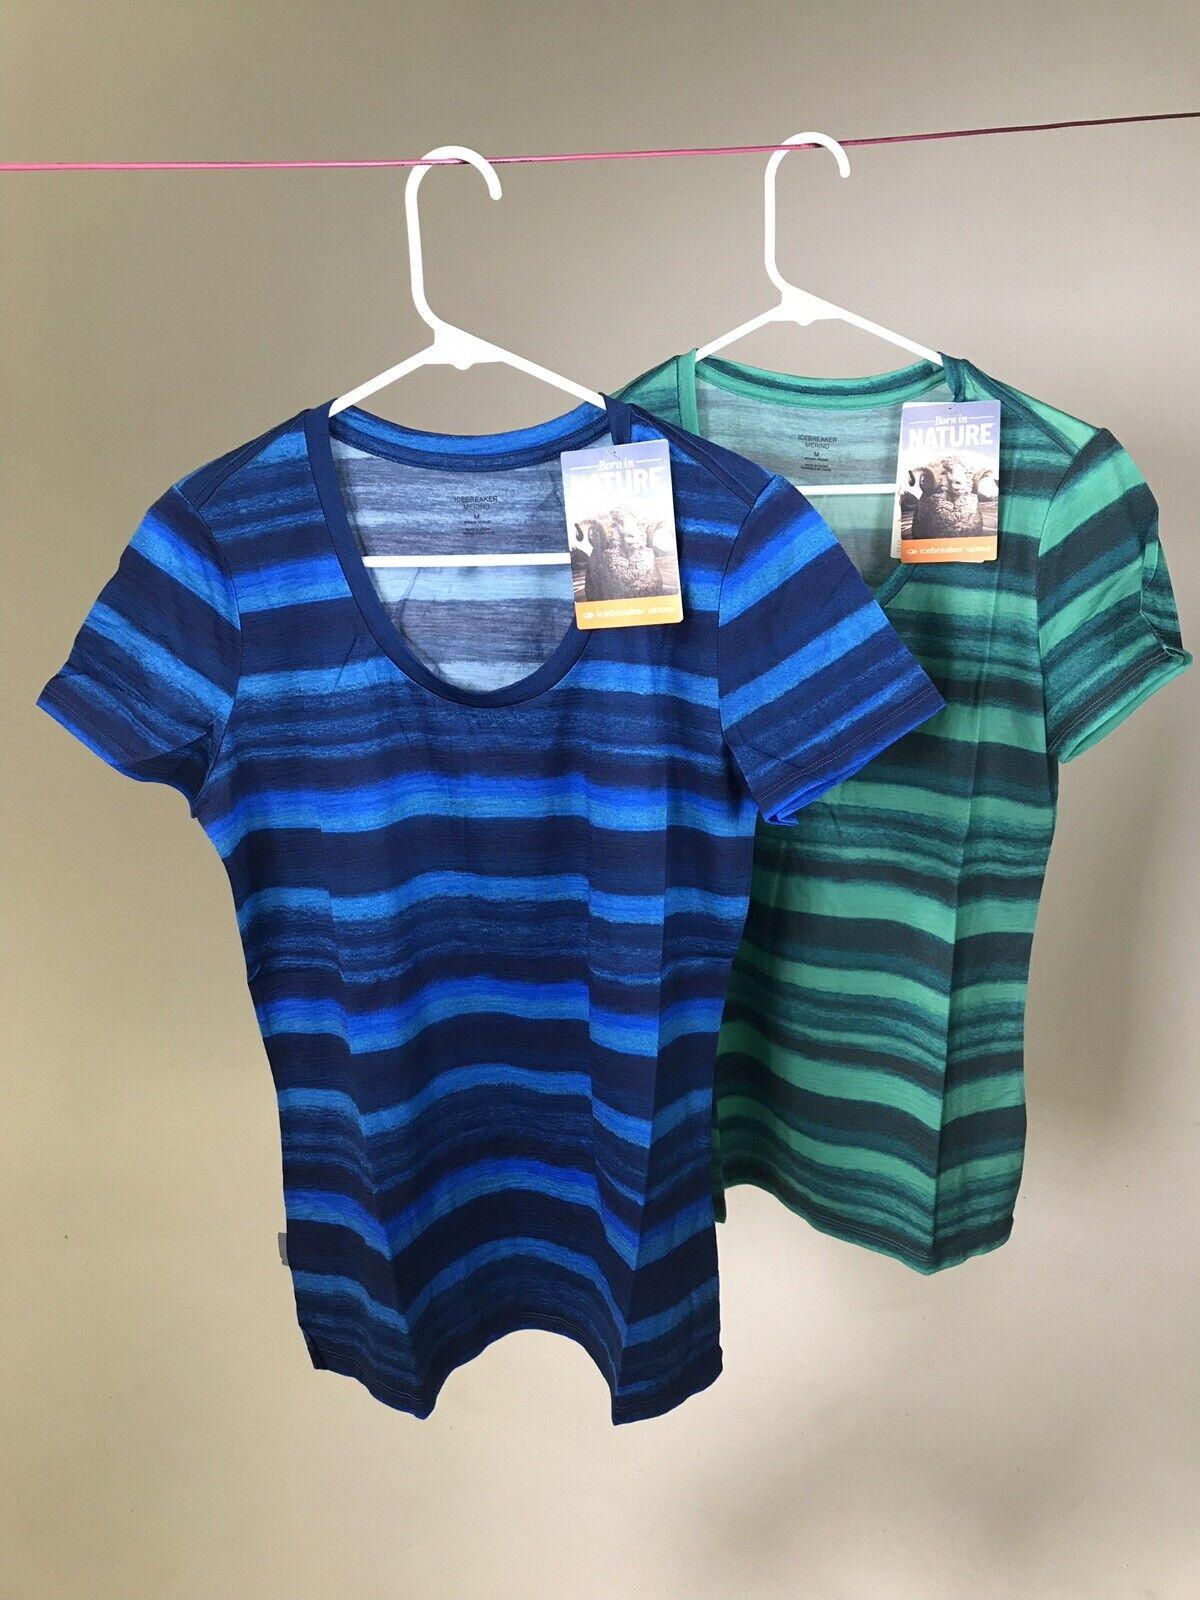 ICEBREAKER Women's Merino Wool Tech Lite Watercooler Small Medium T-Shirt - NWT